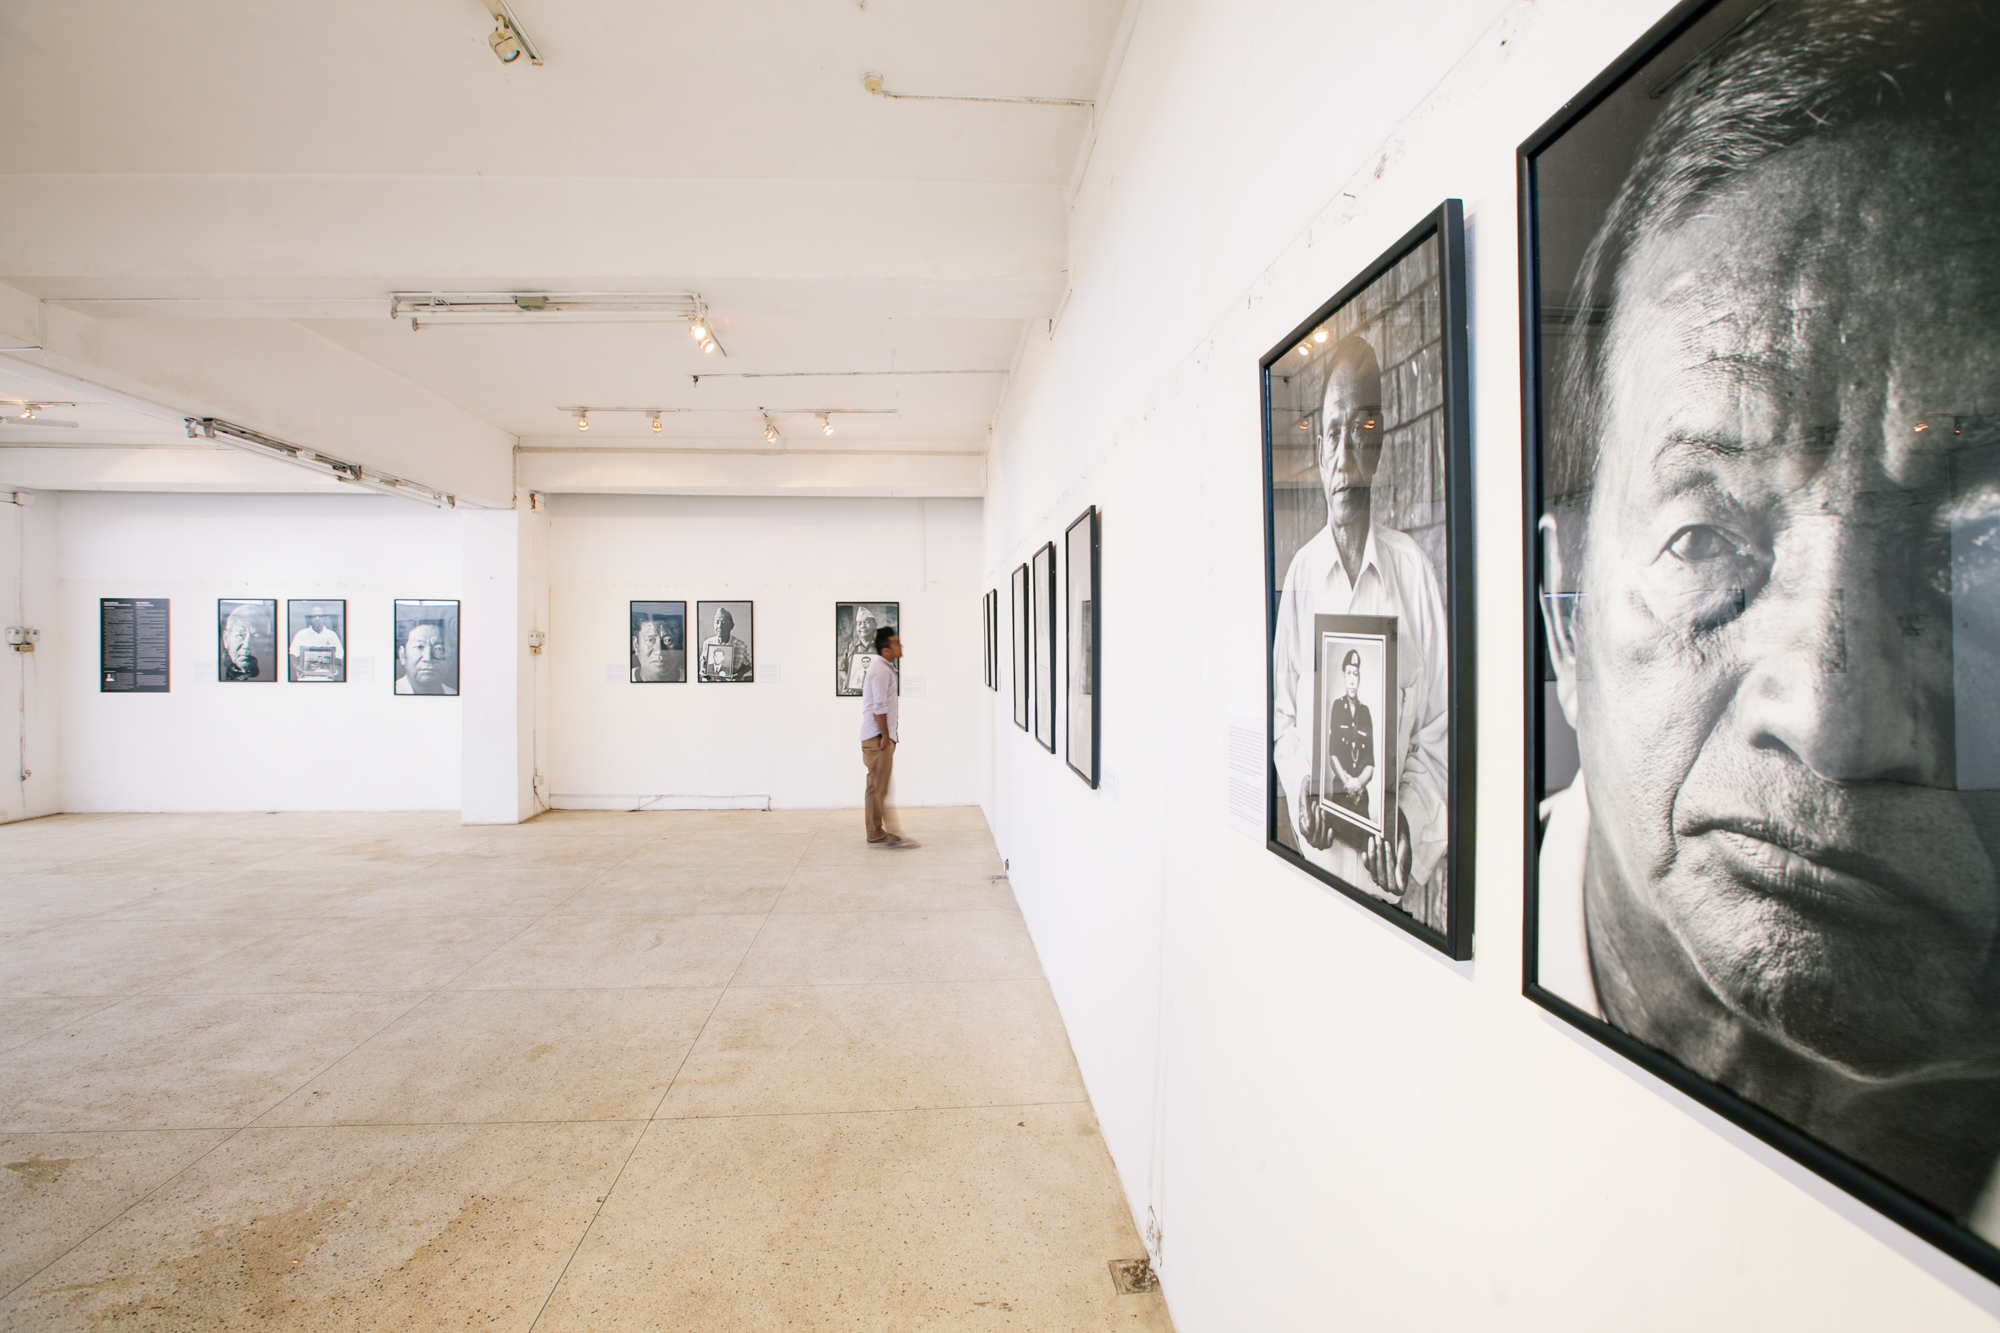 singapore-gurkhas-portraits-zakaria-zainal-3.jpg